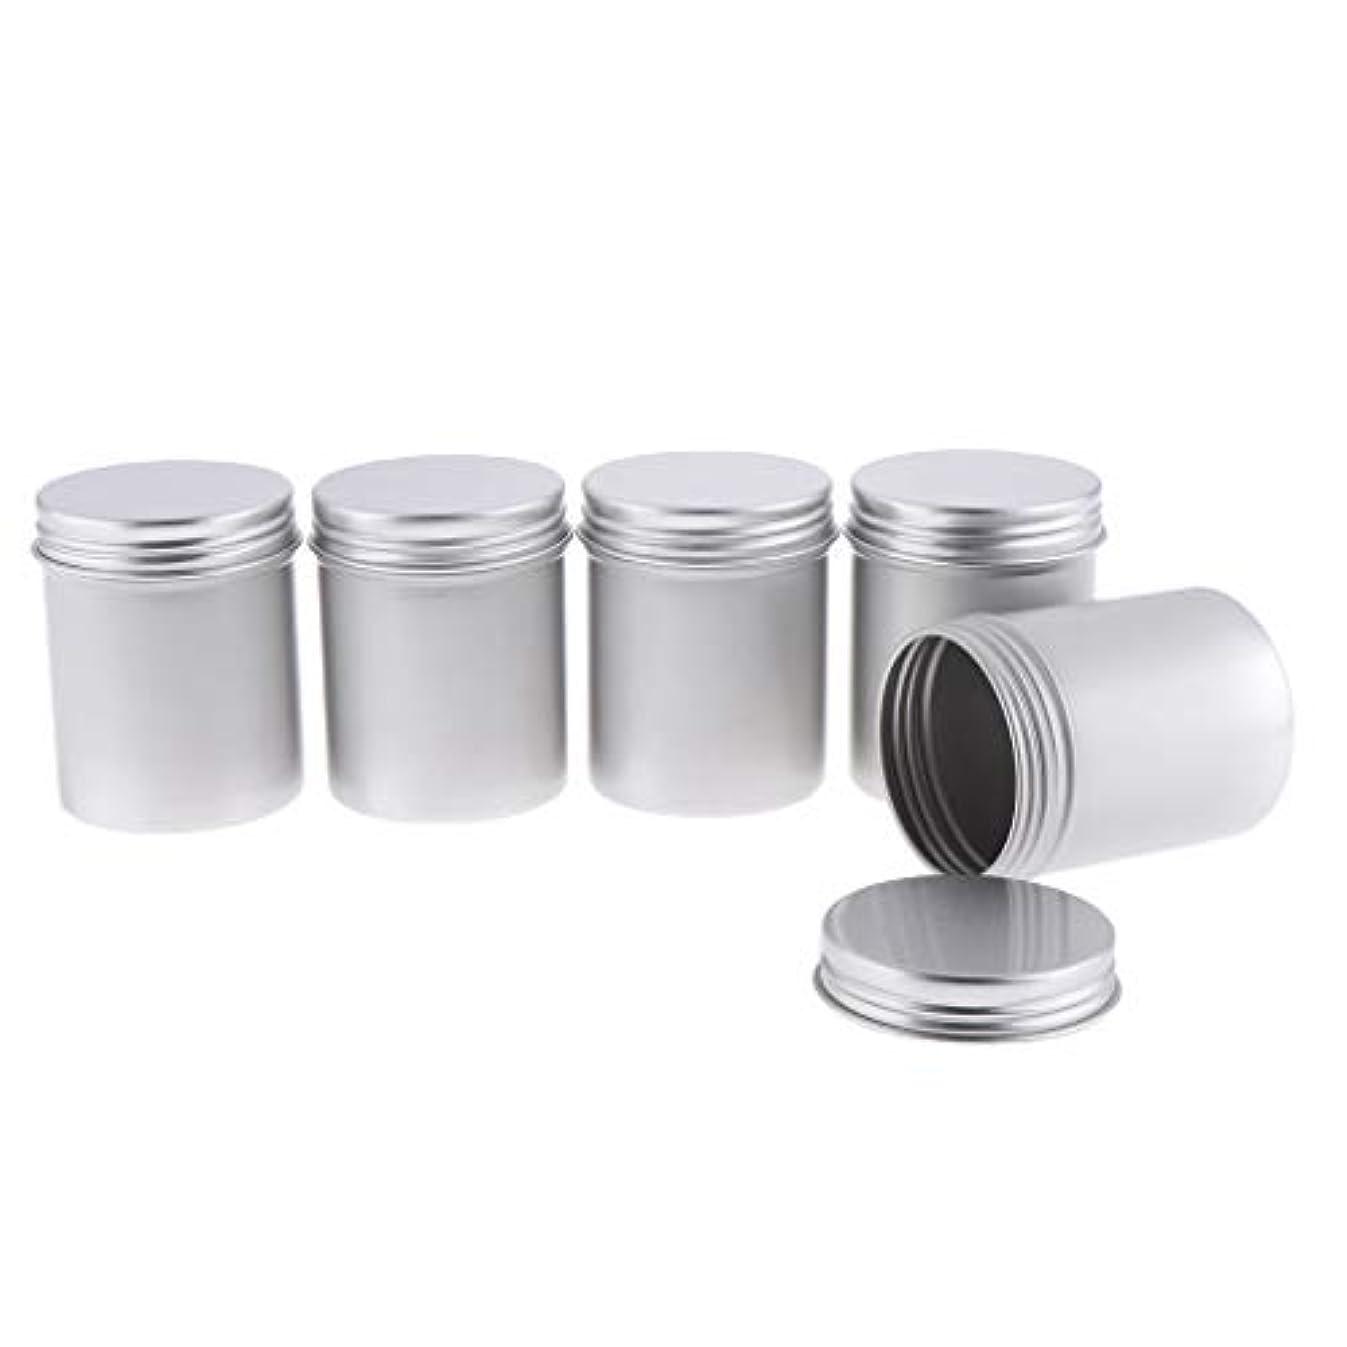 B Blesiya 5本 アルミ缶 DIY コスメ リップクリーム キャンデー サンプルボトル ラウンド コンテナ